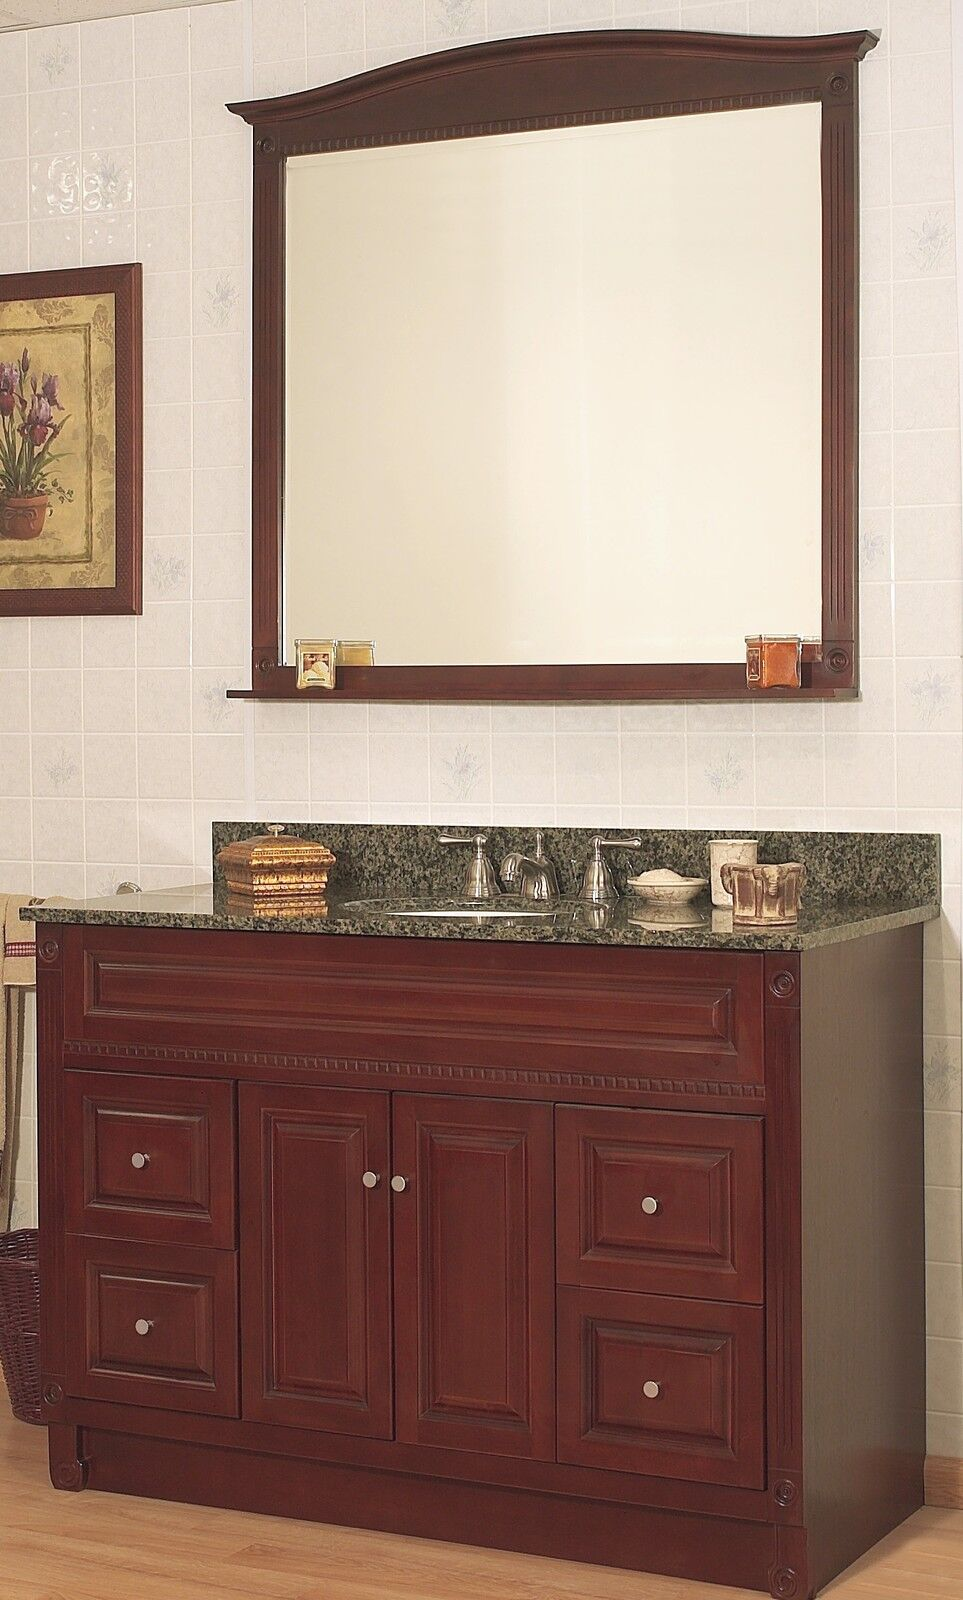 Jsi Concord 48 Cherry Bathroom Vanity Set 4 Drawer Cabinet Base W 30 Mirror Ebay